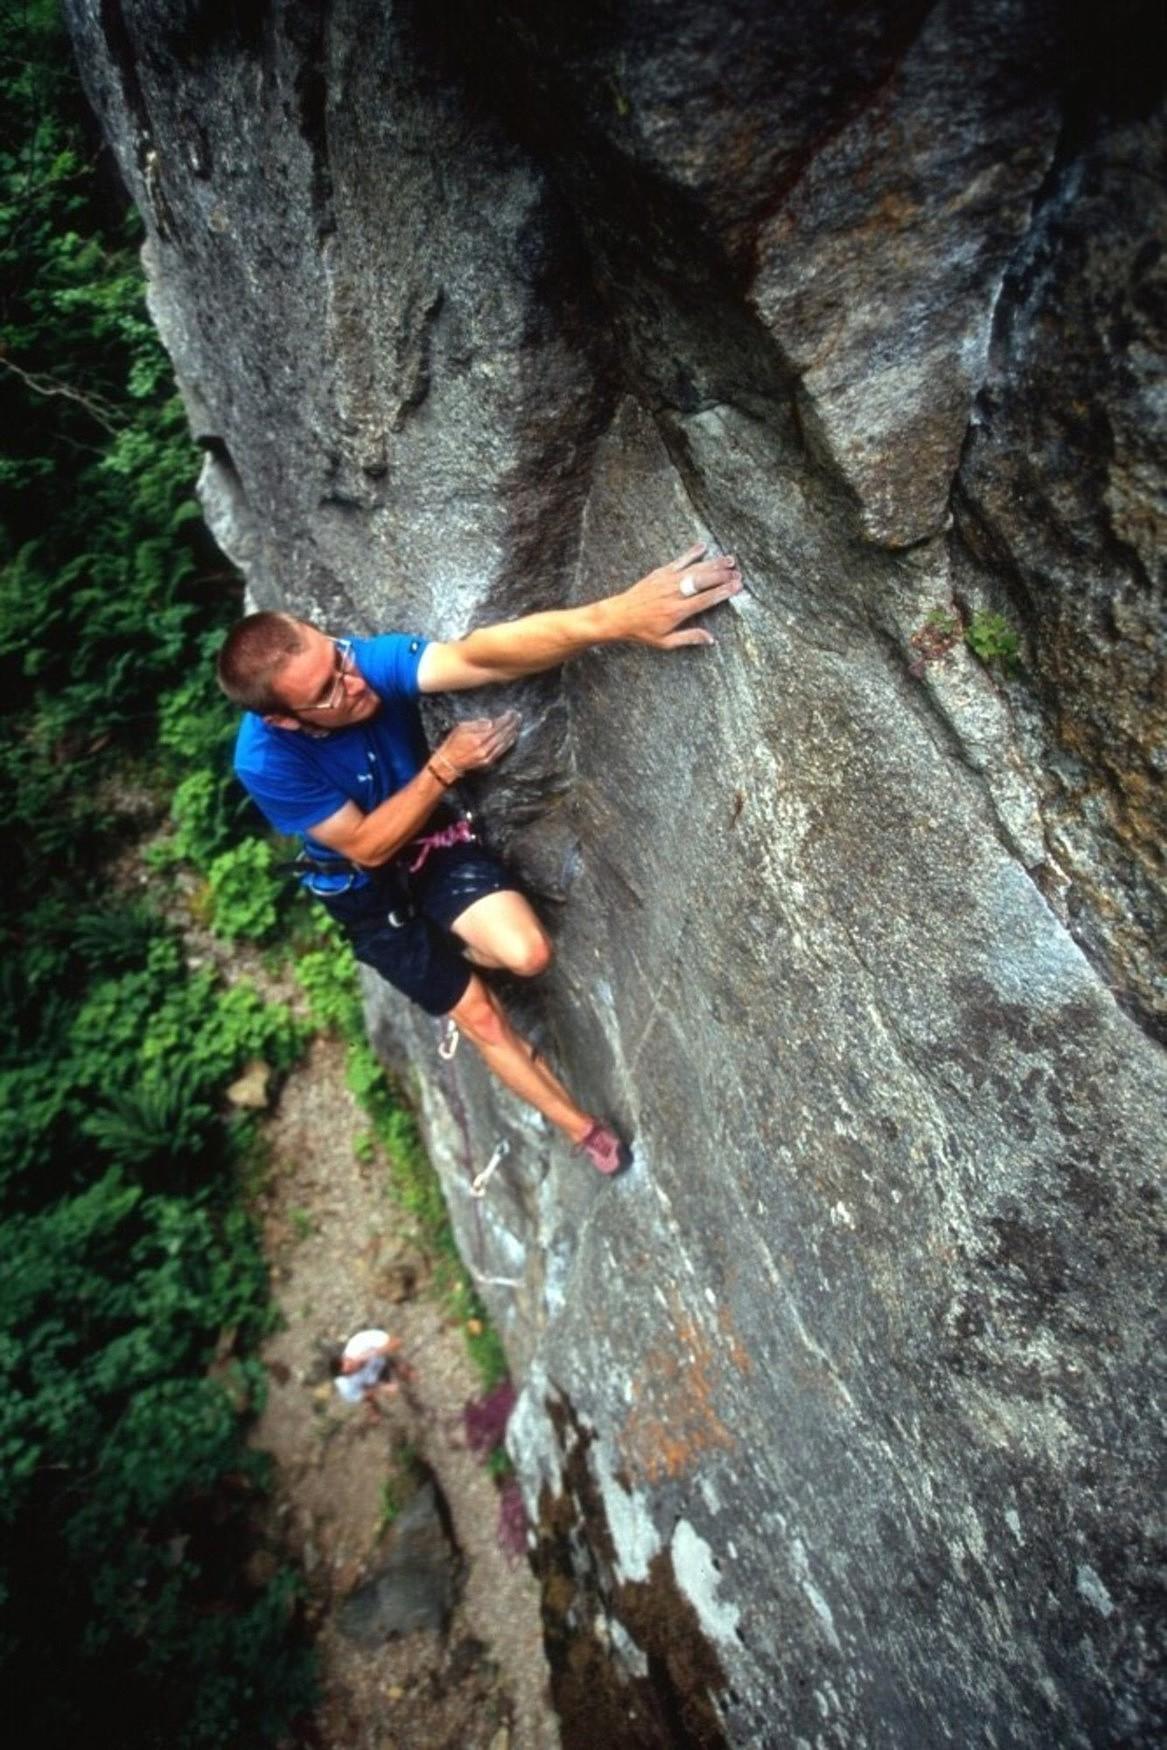 Luke Distelhorst at Newhalem by Kris Taylor.